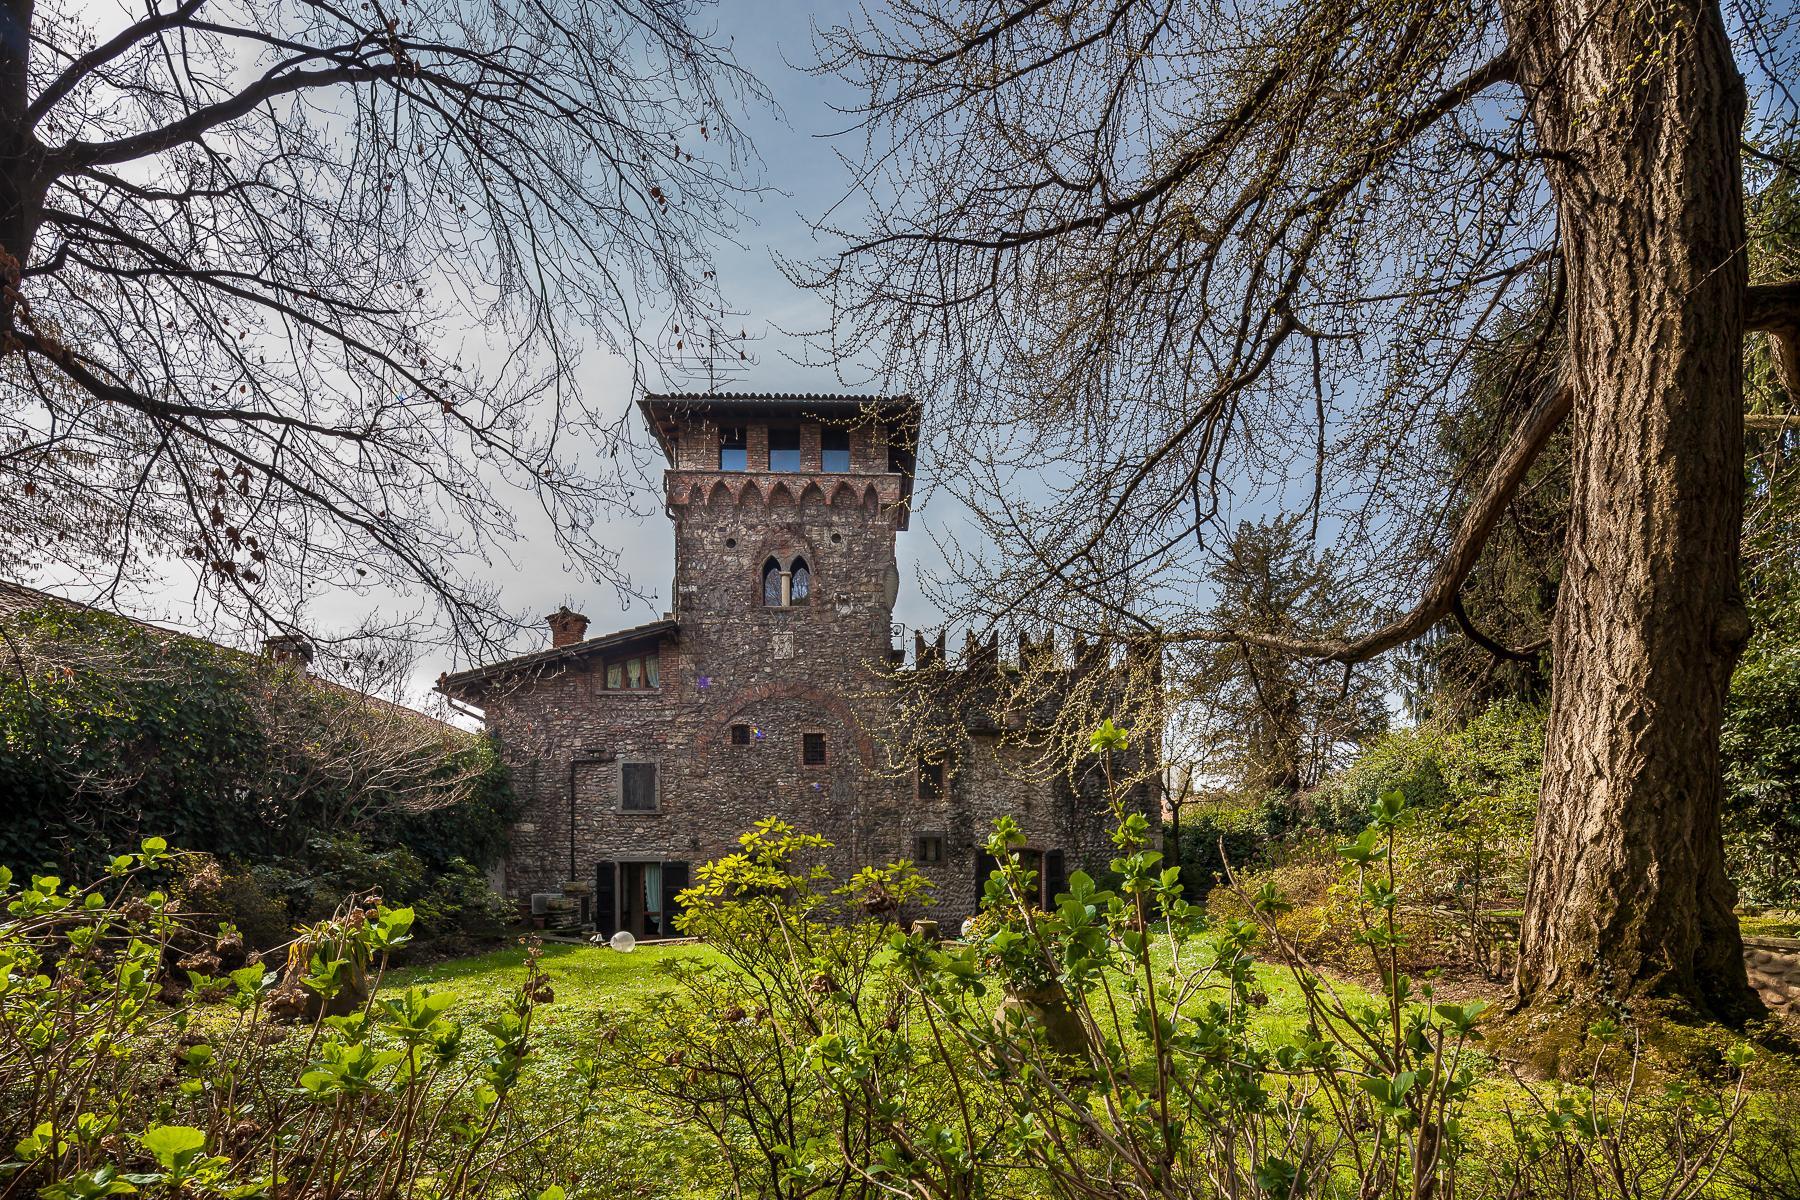 Ravissant château du XIIIe siècle - 1